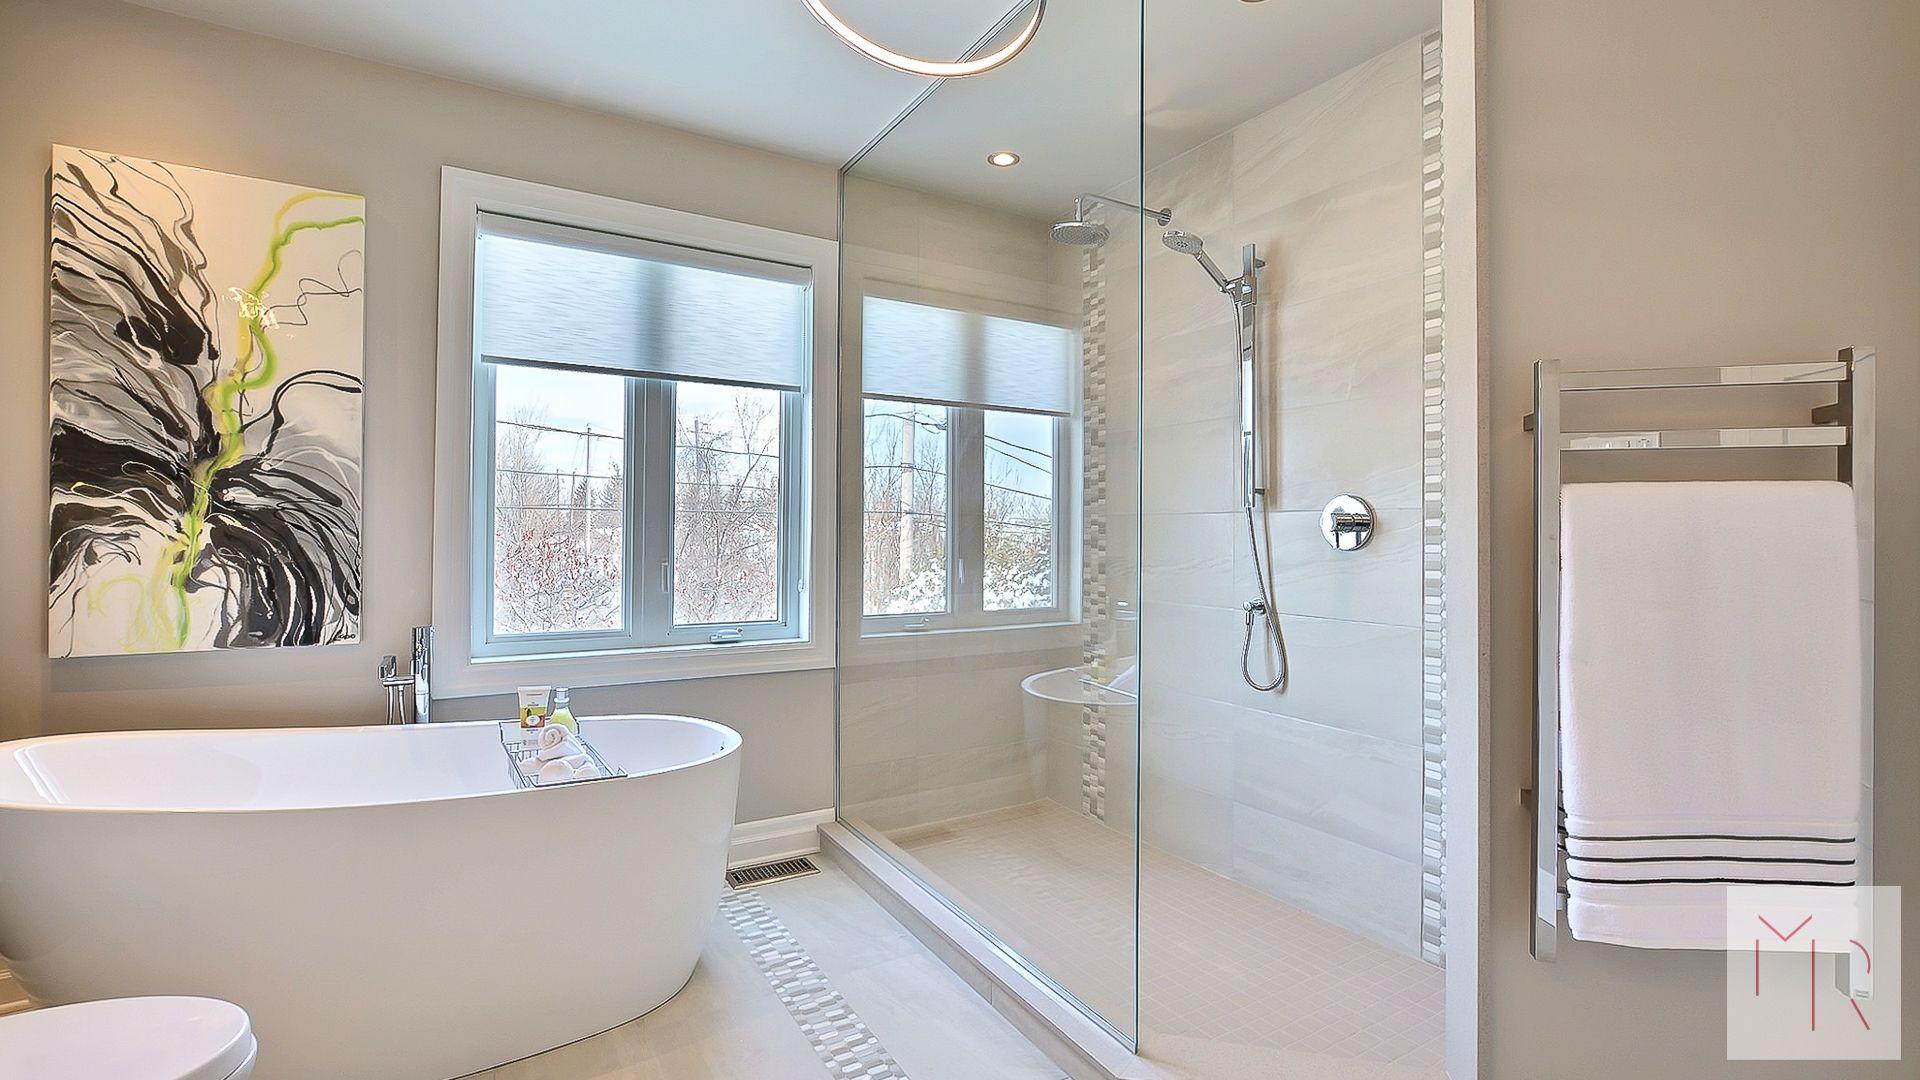 Bathroom interior hd la pure  home  pinterest  open showers freestanding bath and